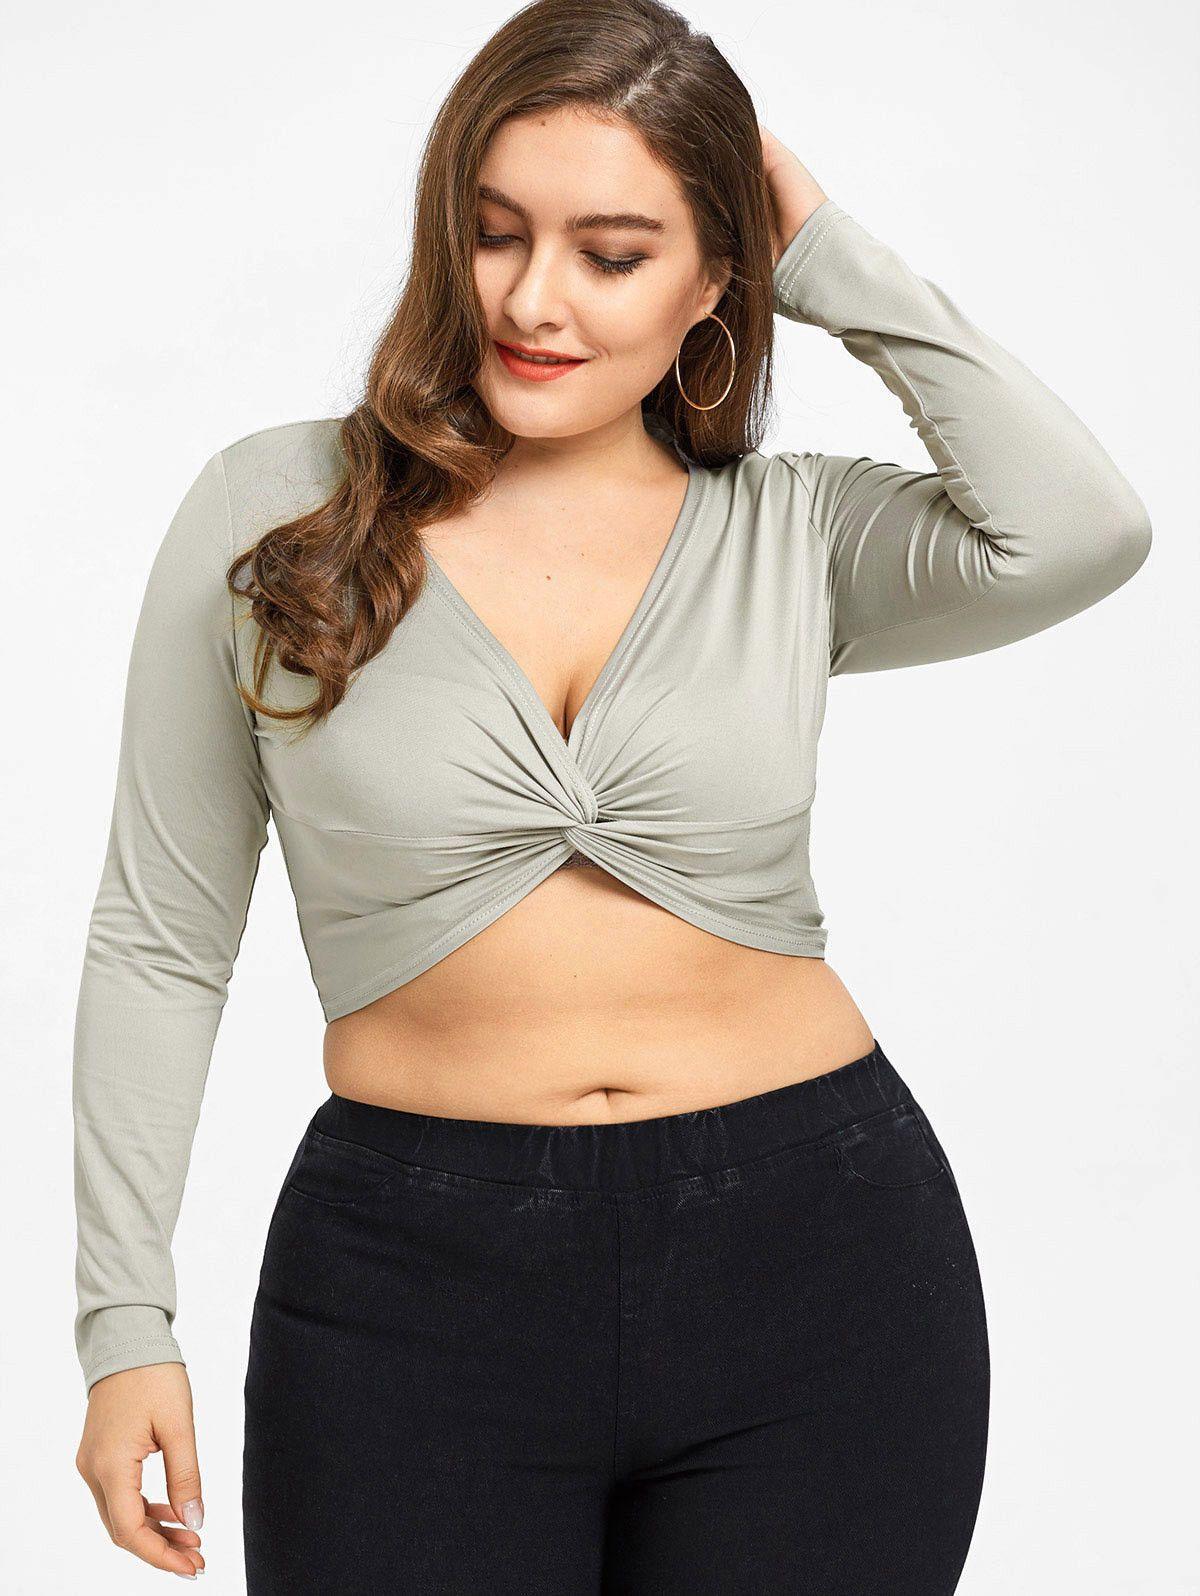 eb43099fb7ee1  6.99 - Women s Plus Size Front Twist Crop Top Xl-5Xl Long Sleeve Top  Blouse  ebay  Fashion